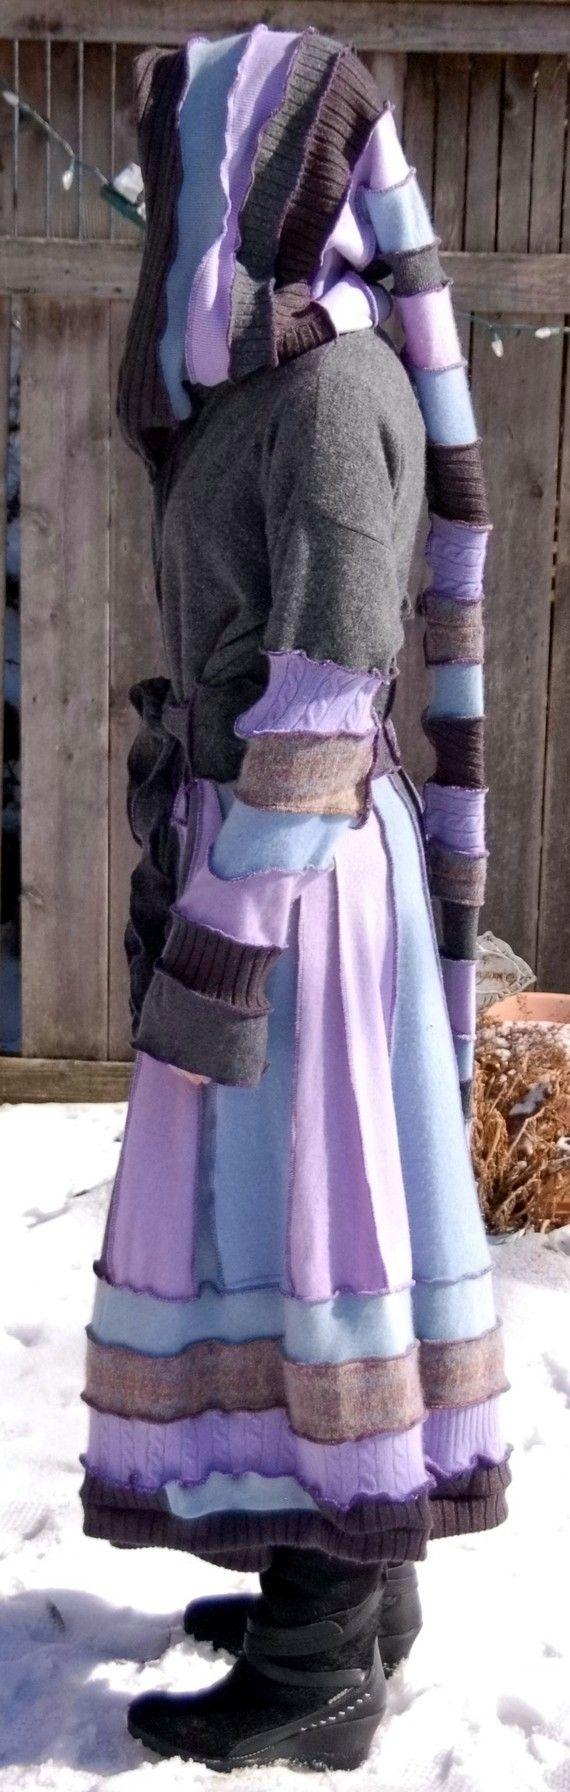 Farb-und Stilberatung mit www.farben-reich.com - Recycled sweaters